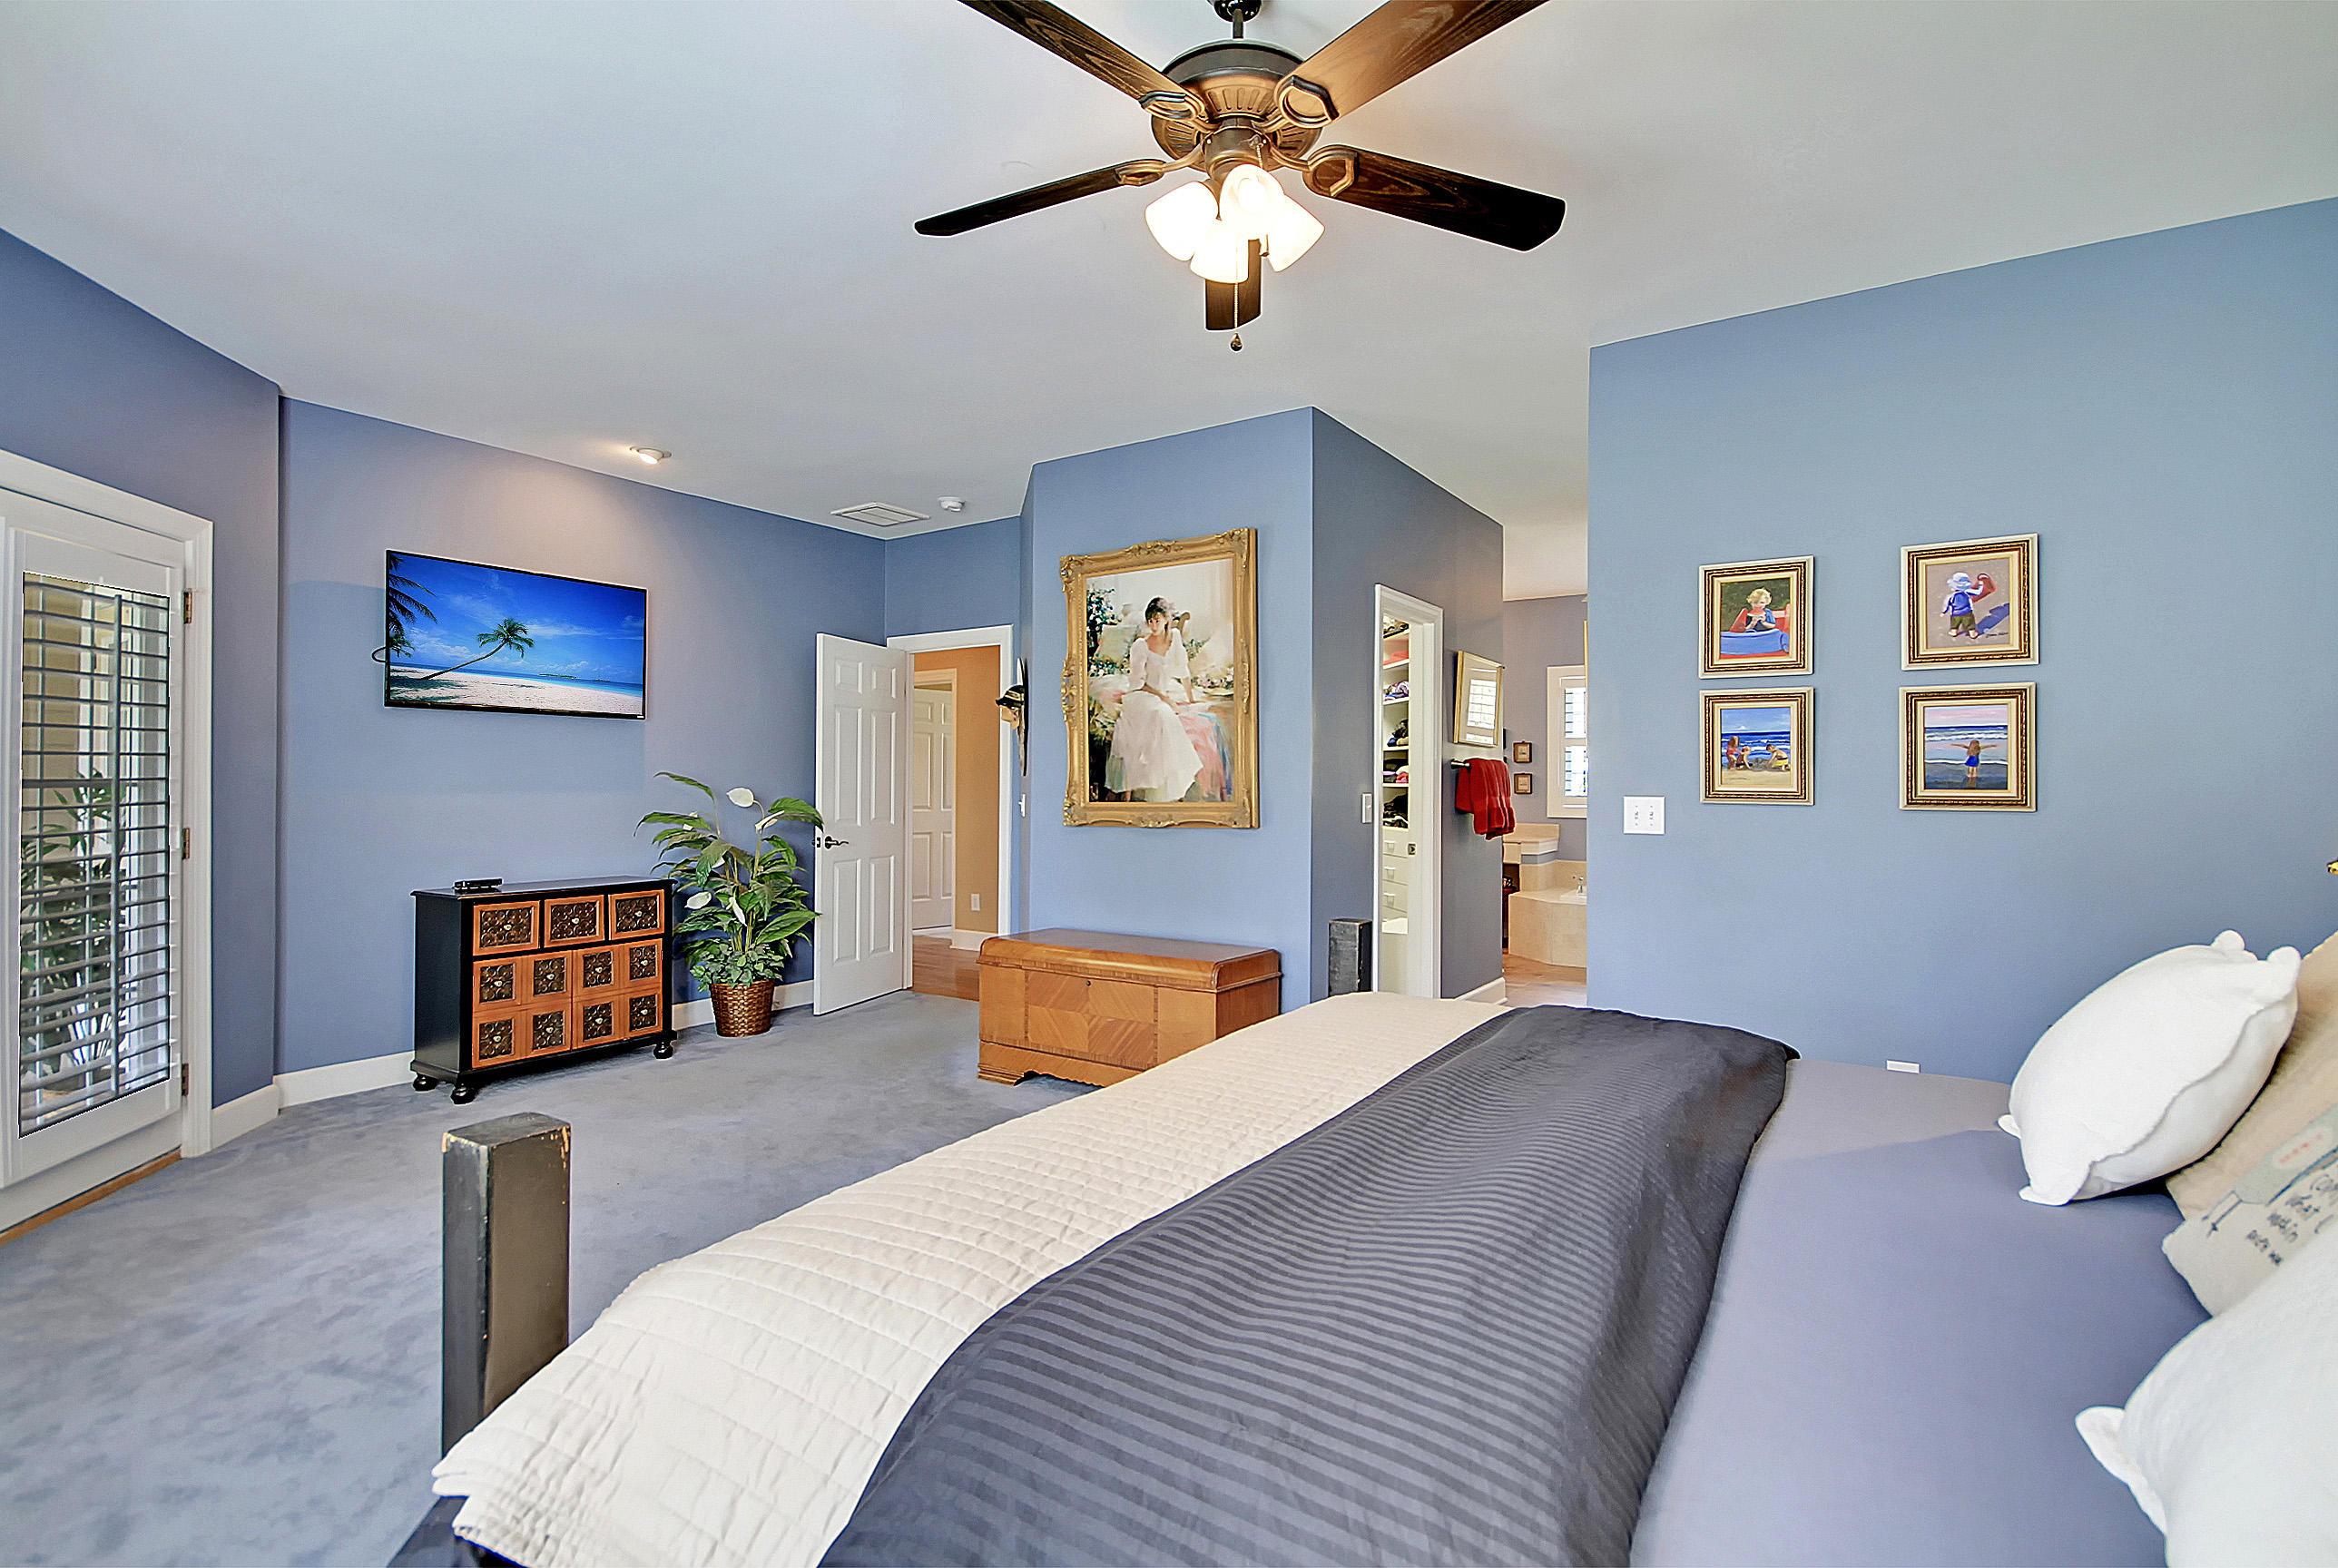 Dunes West Homes For Sale - 4002 Colonel Vanderhorst, Mount Pleasant, SC - 36